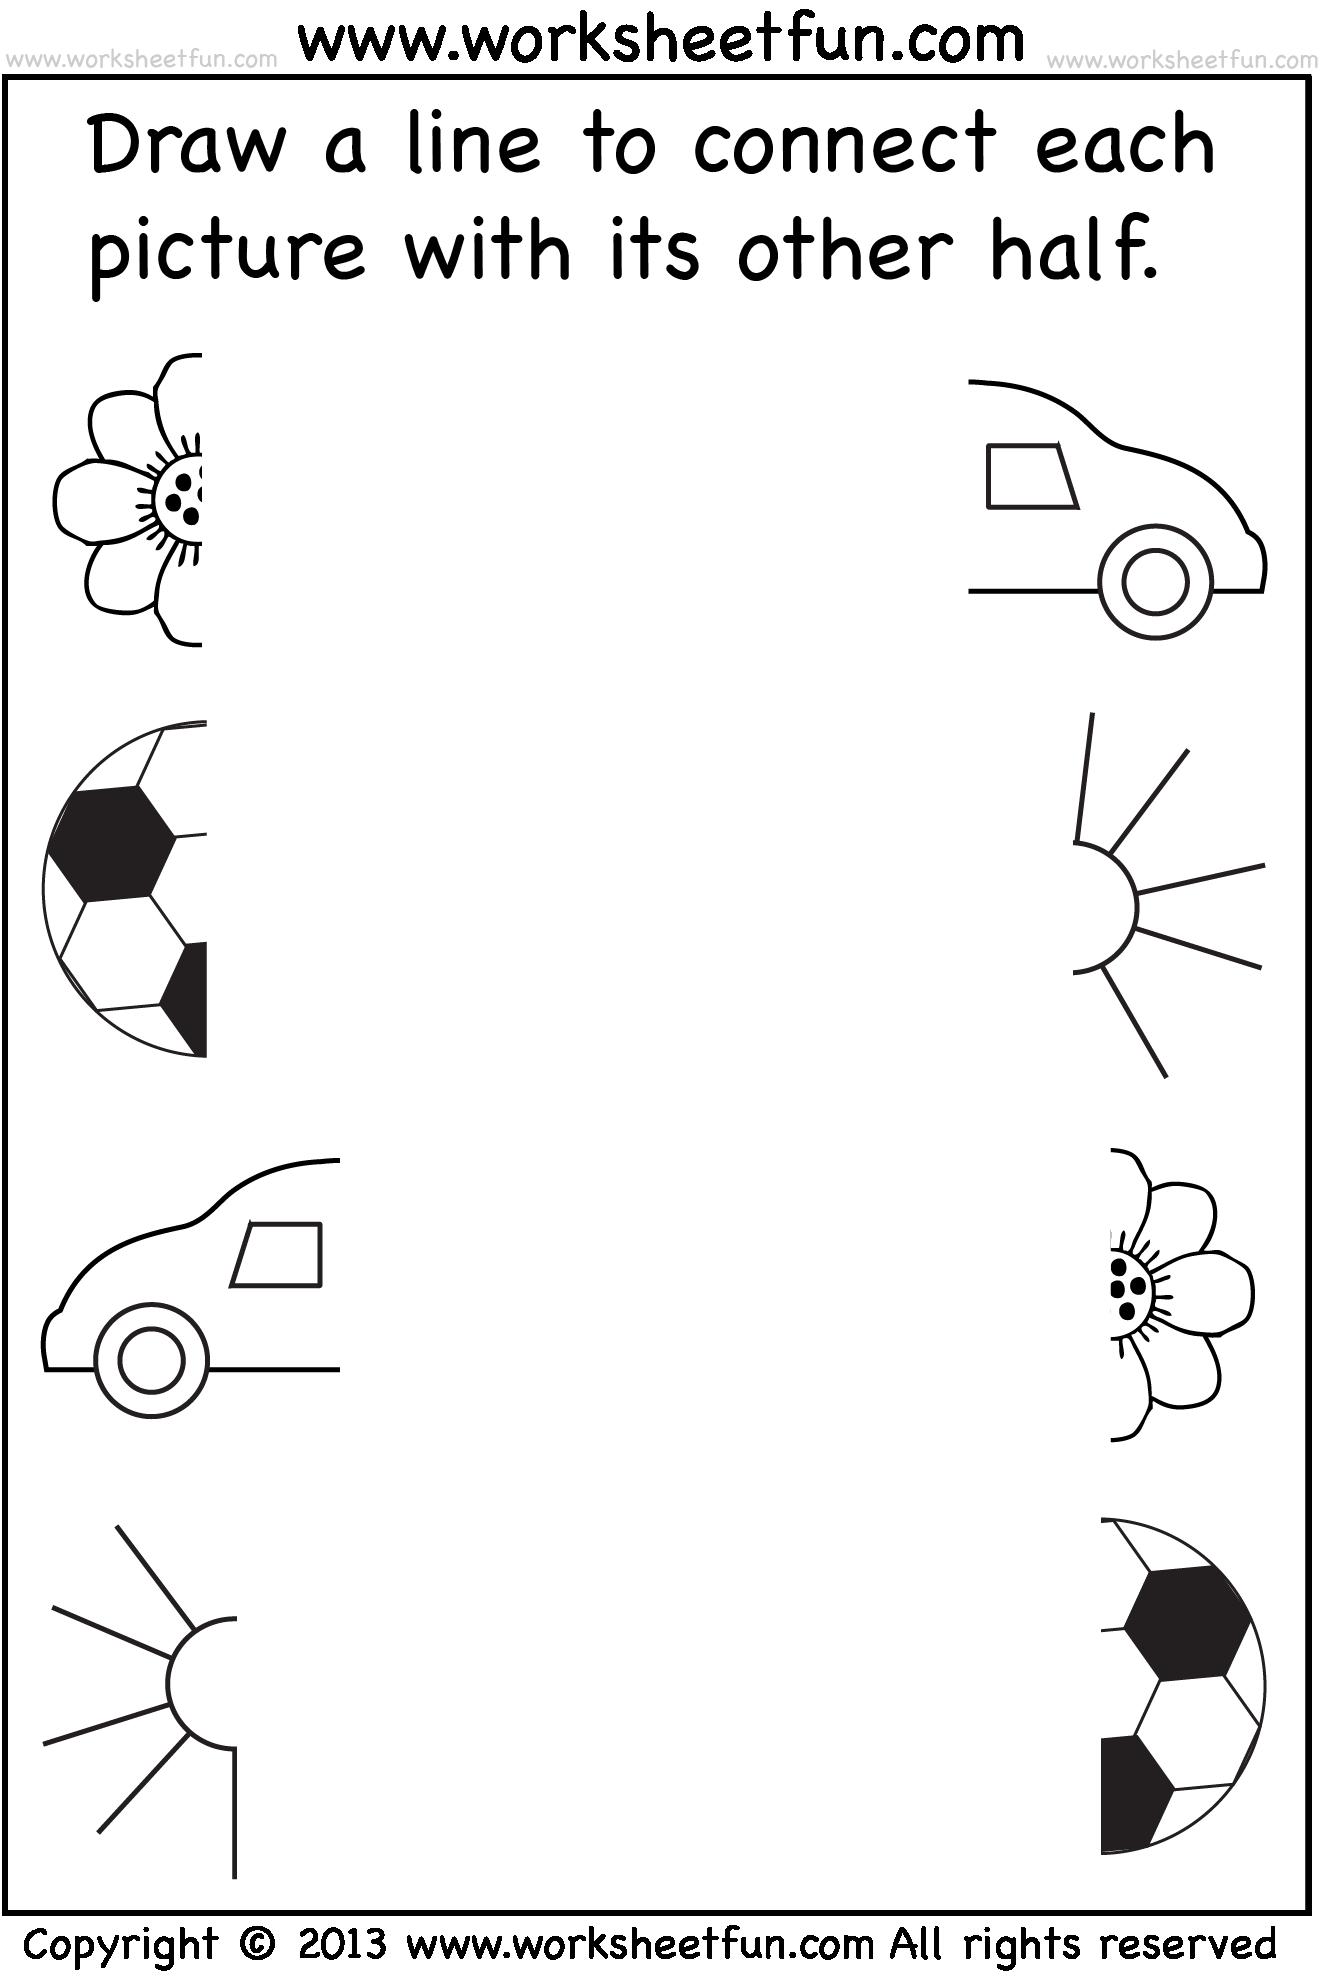 Preschool Worksheets - Connect Pictures - 5 Worksheets ...